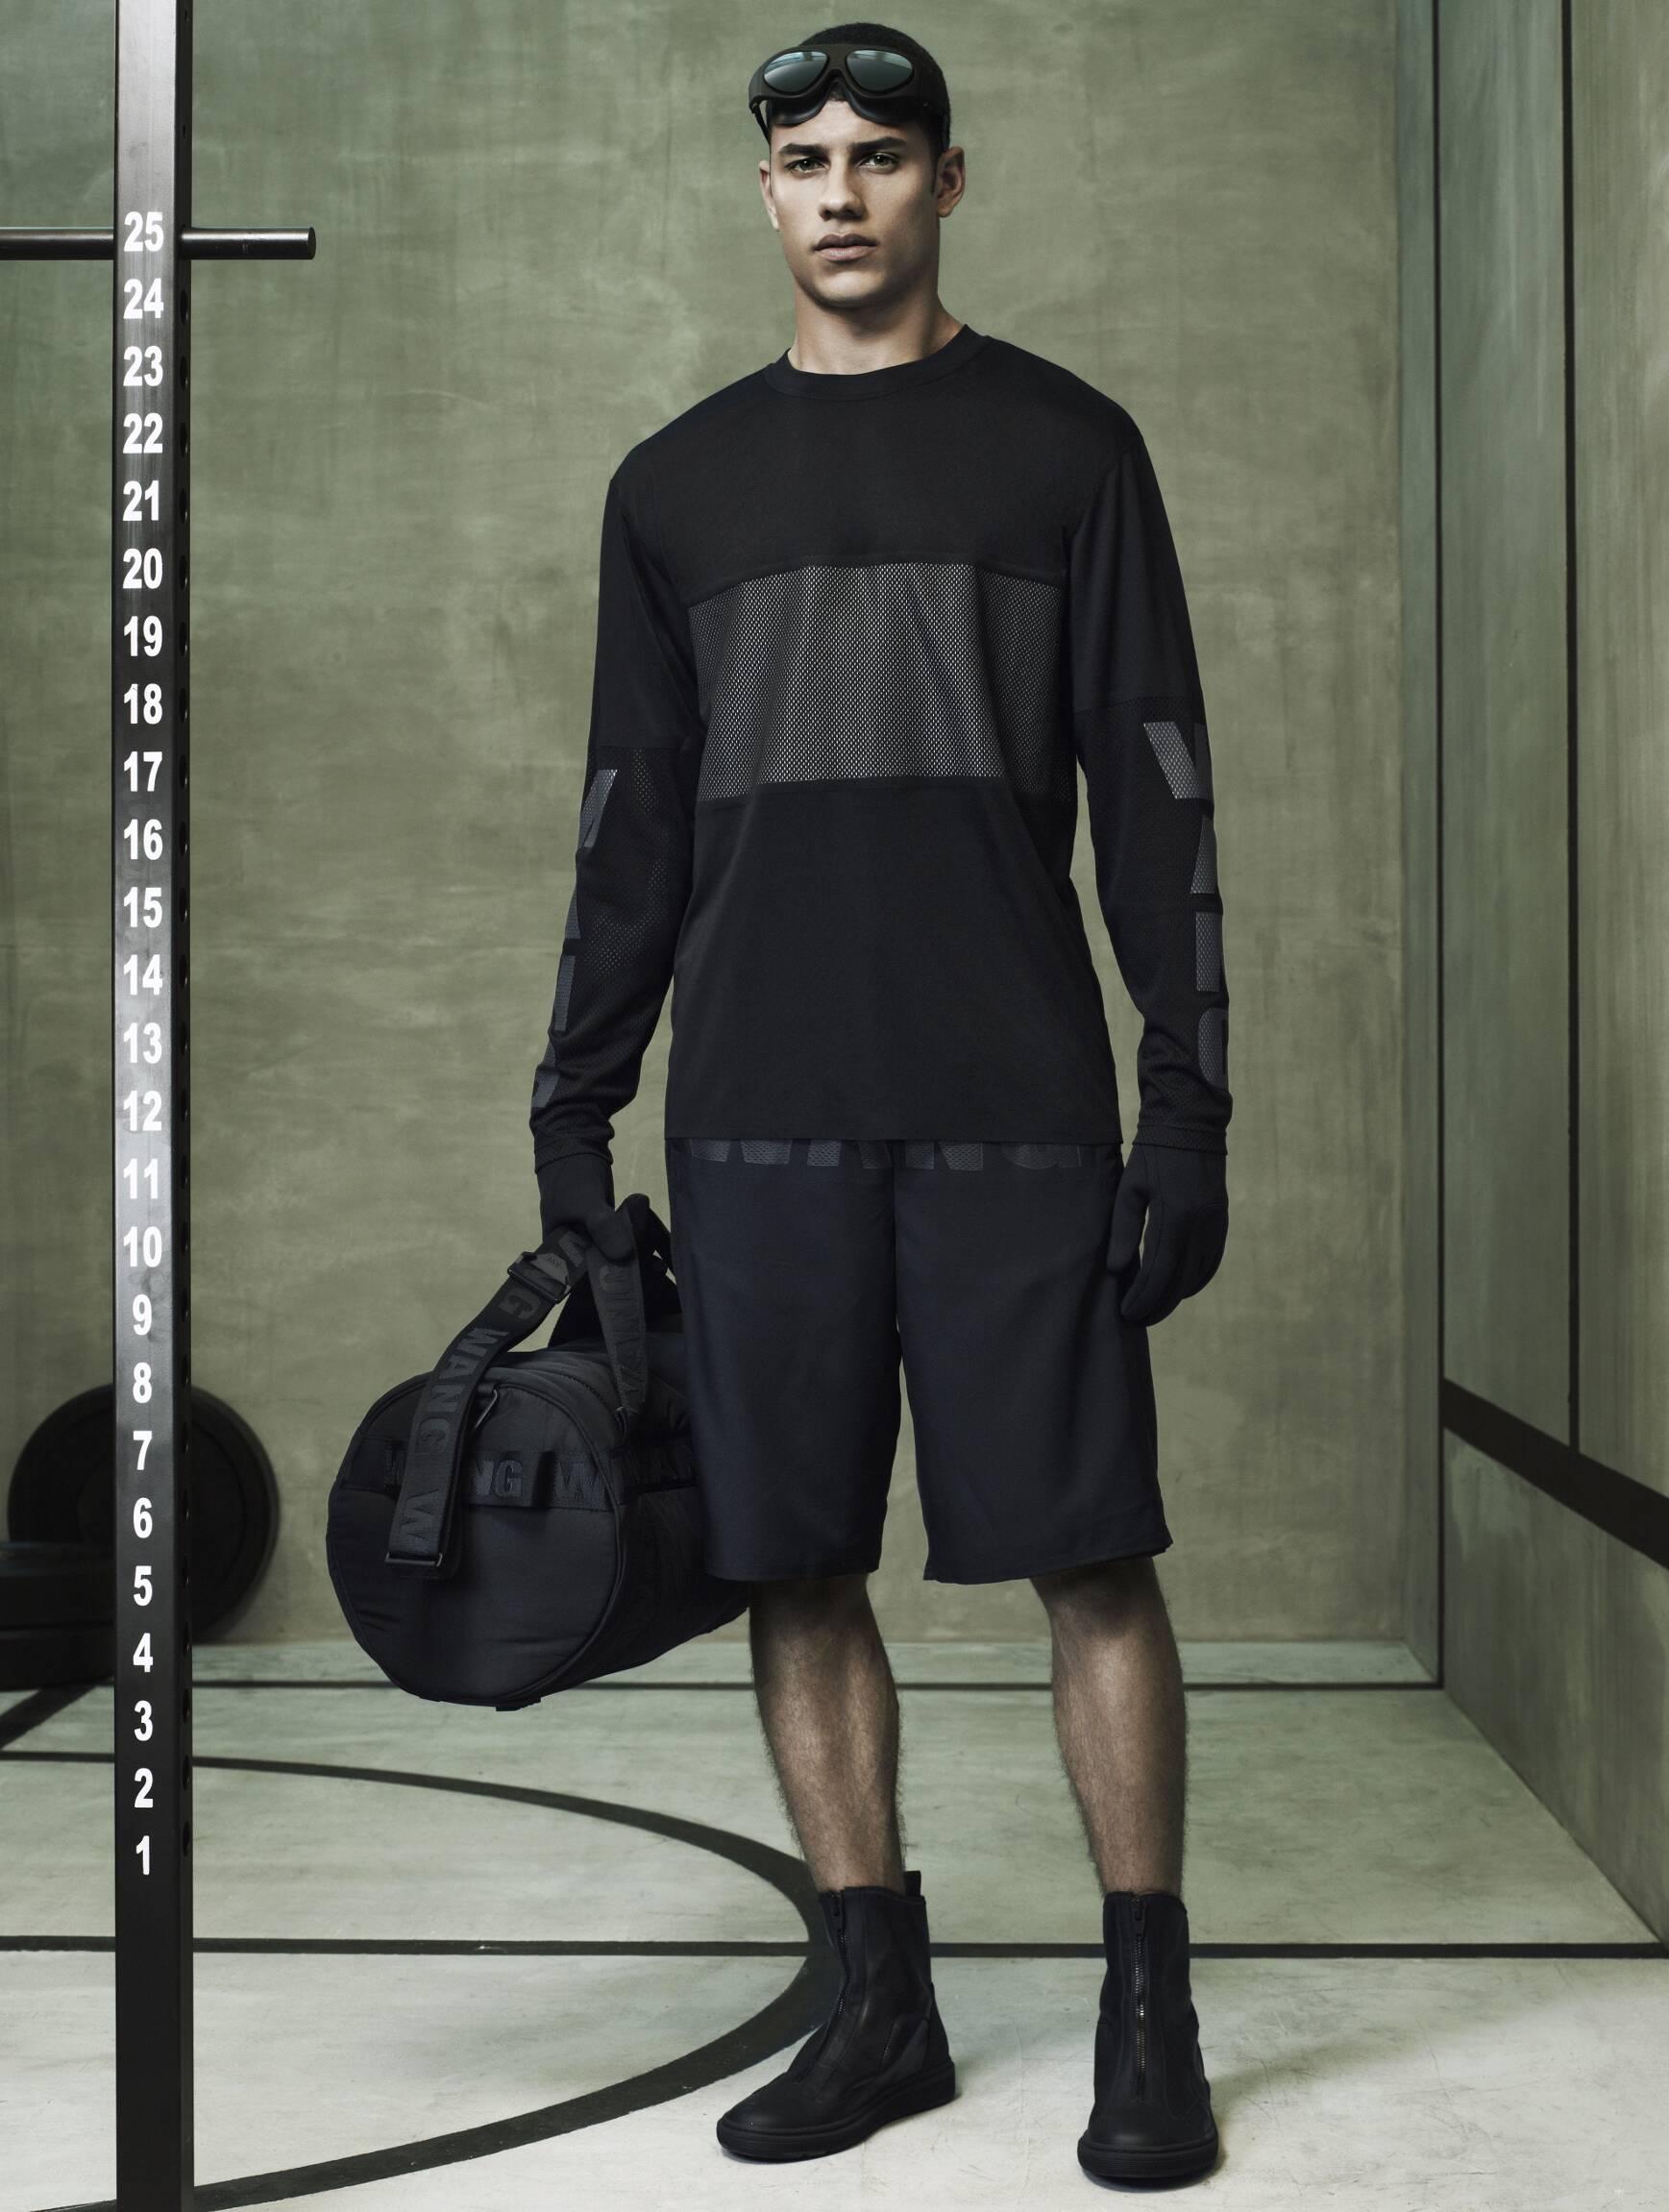 HM Alexander Wang Menswear